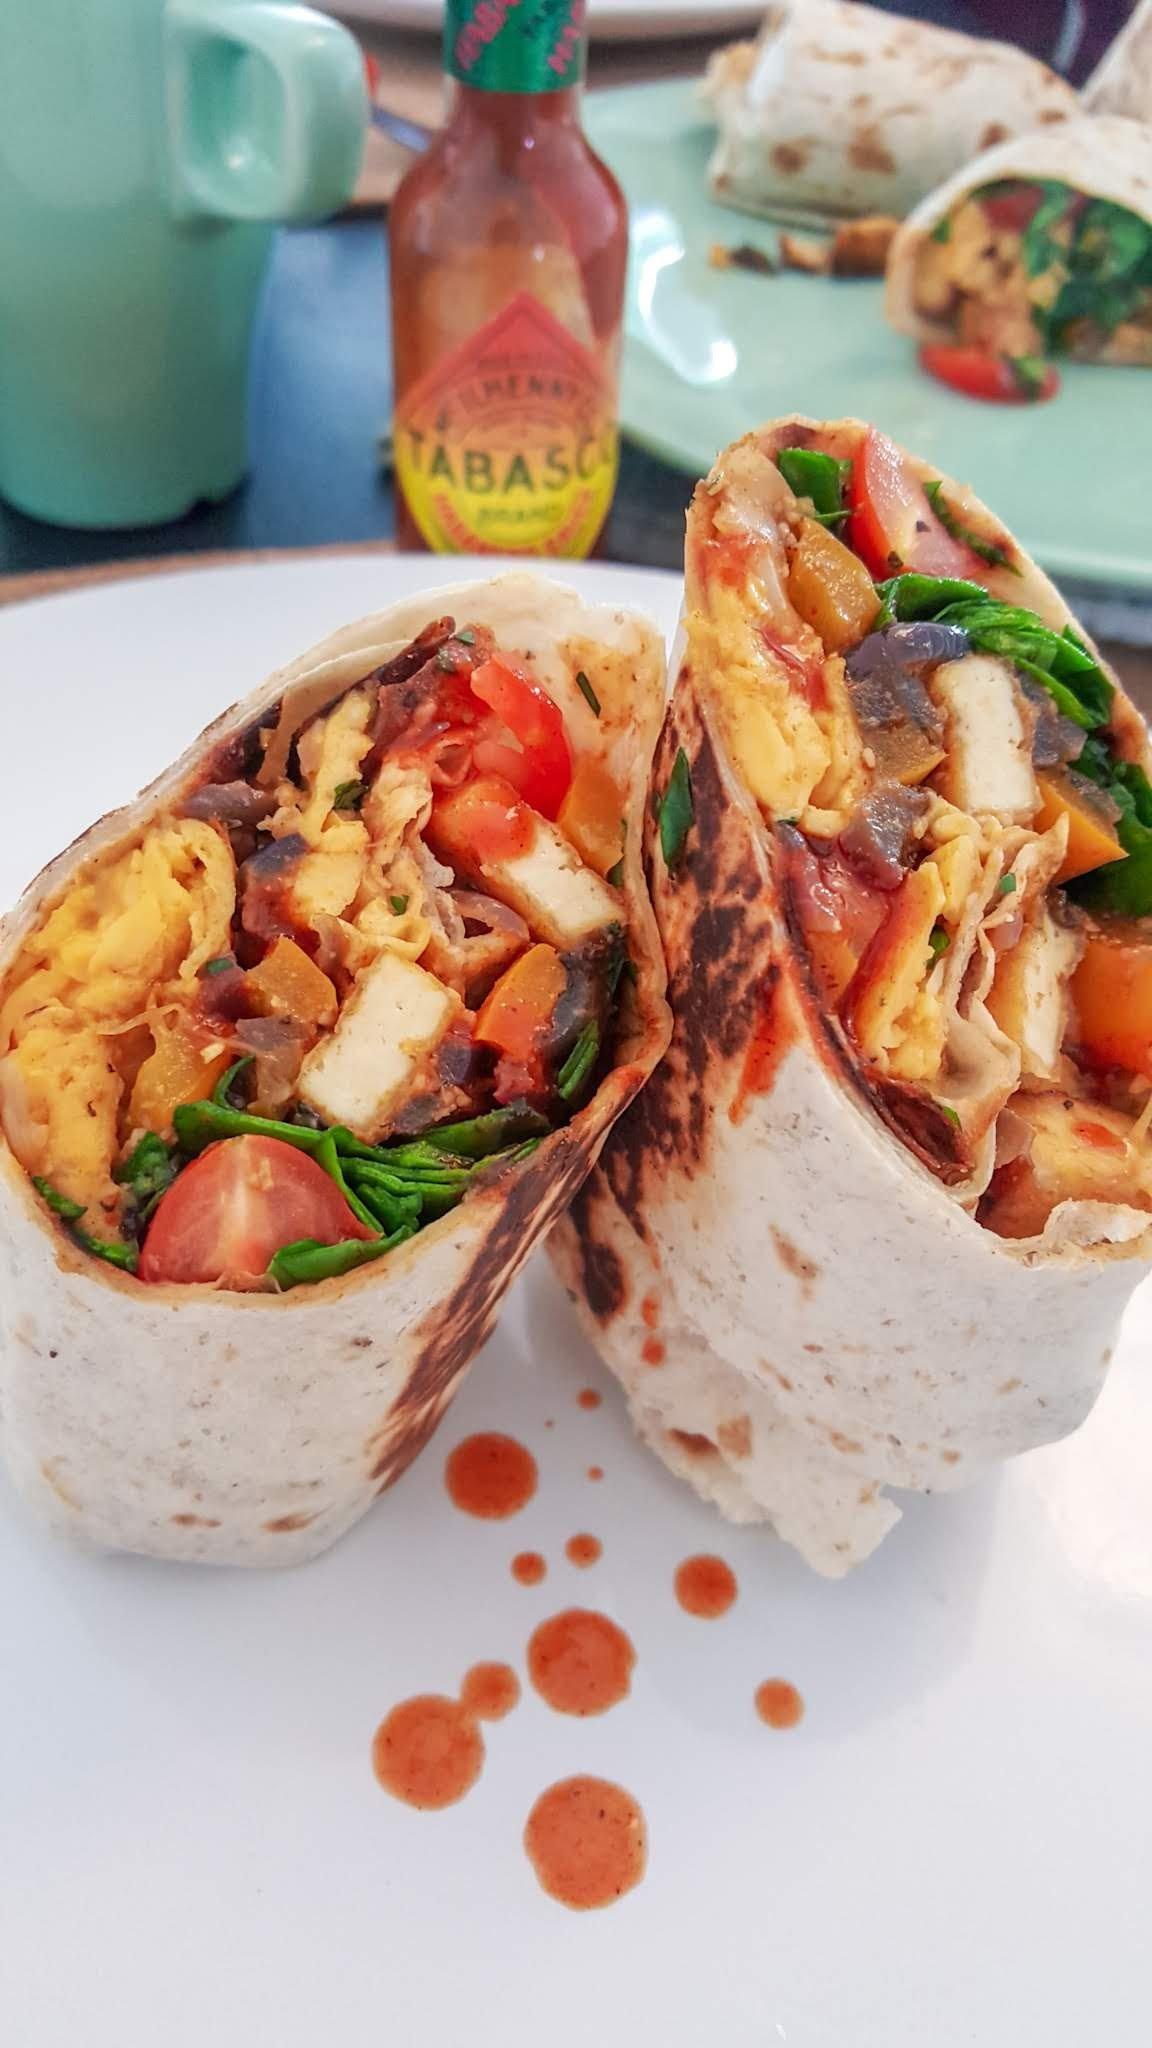 Tofu in a breakfast burrito